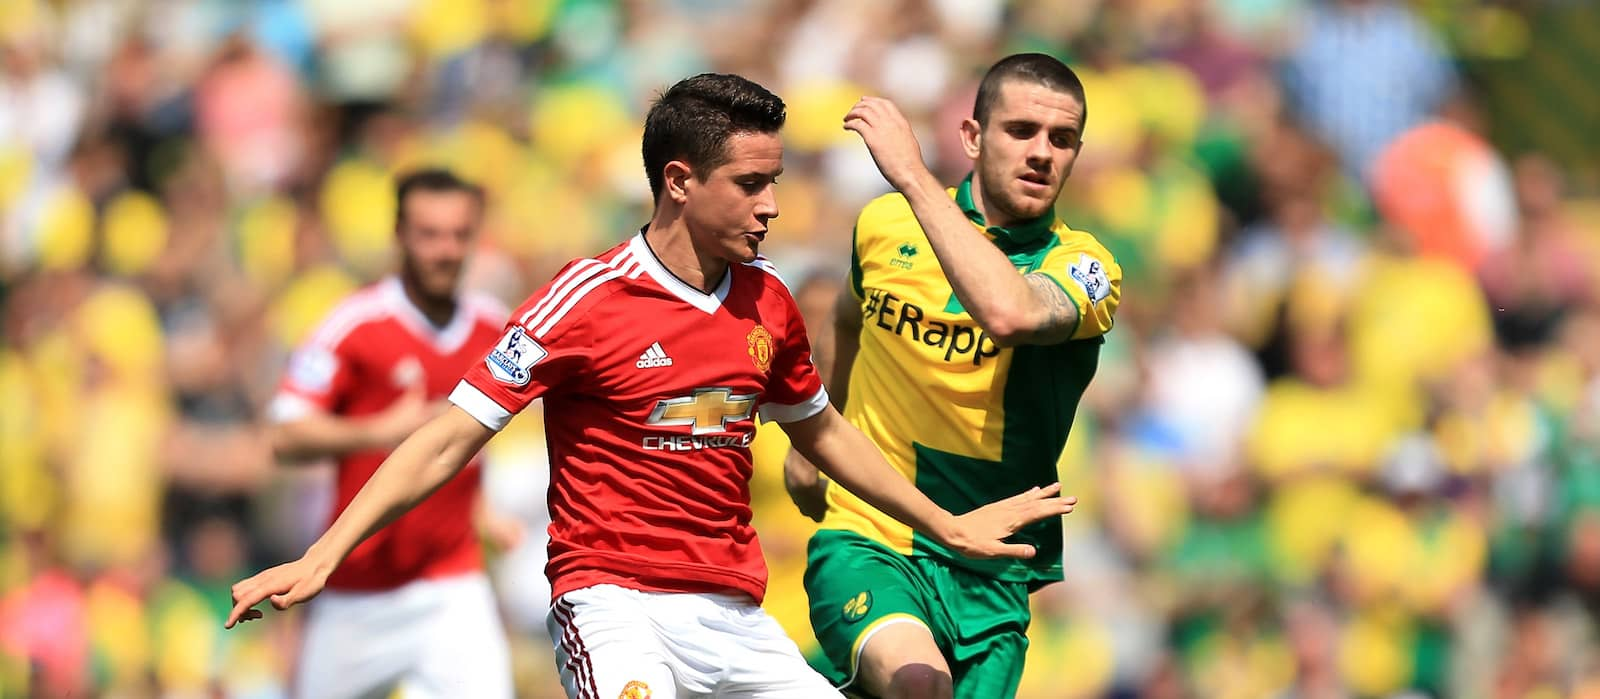 Michael Owen: Manchester United were 'average' against Norwich City